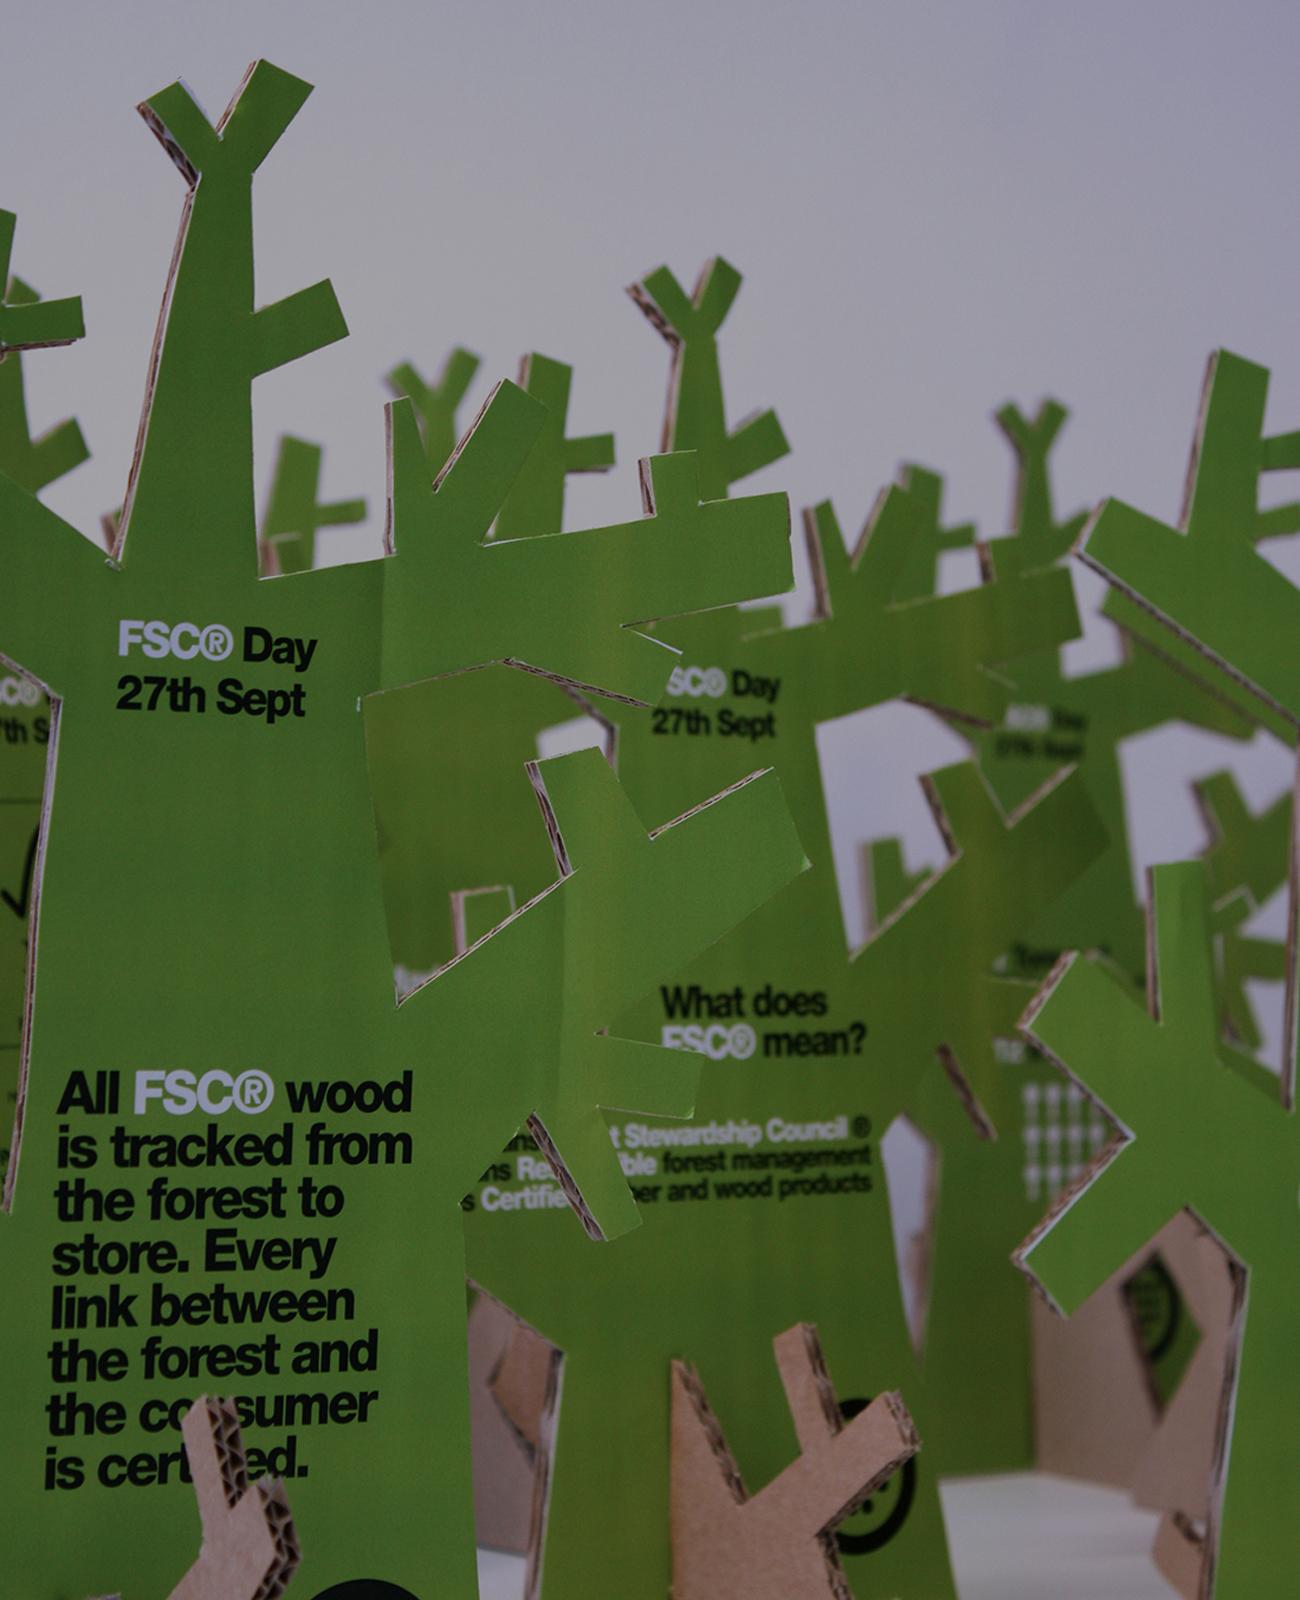 1300 FSC trees